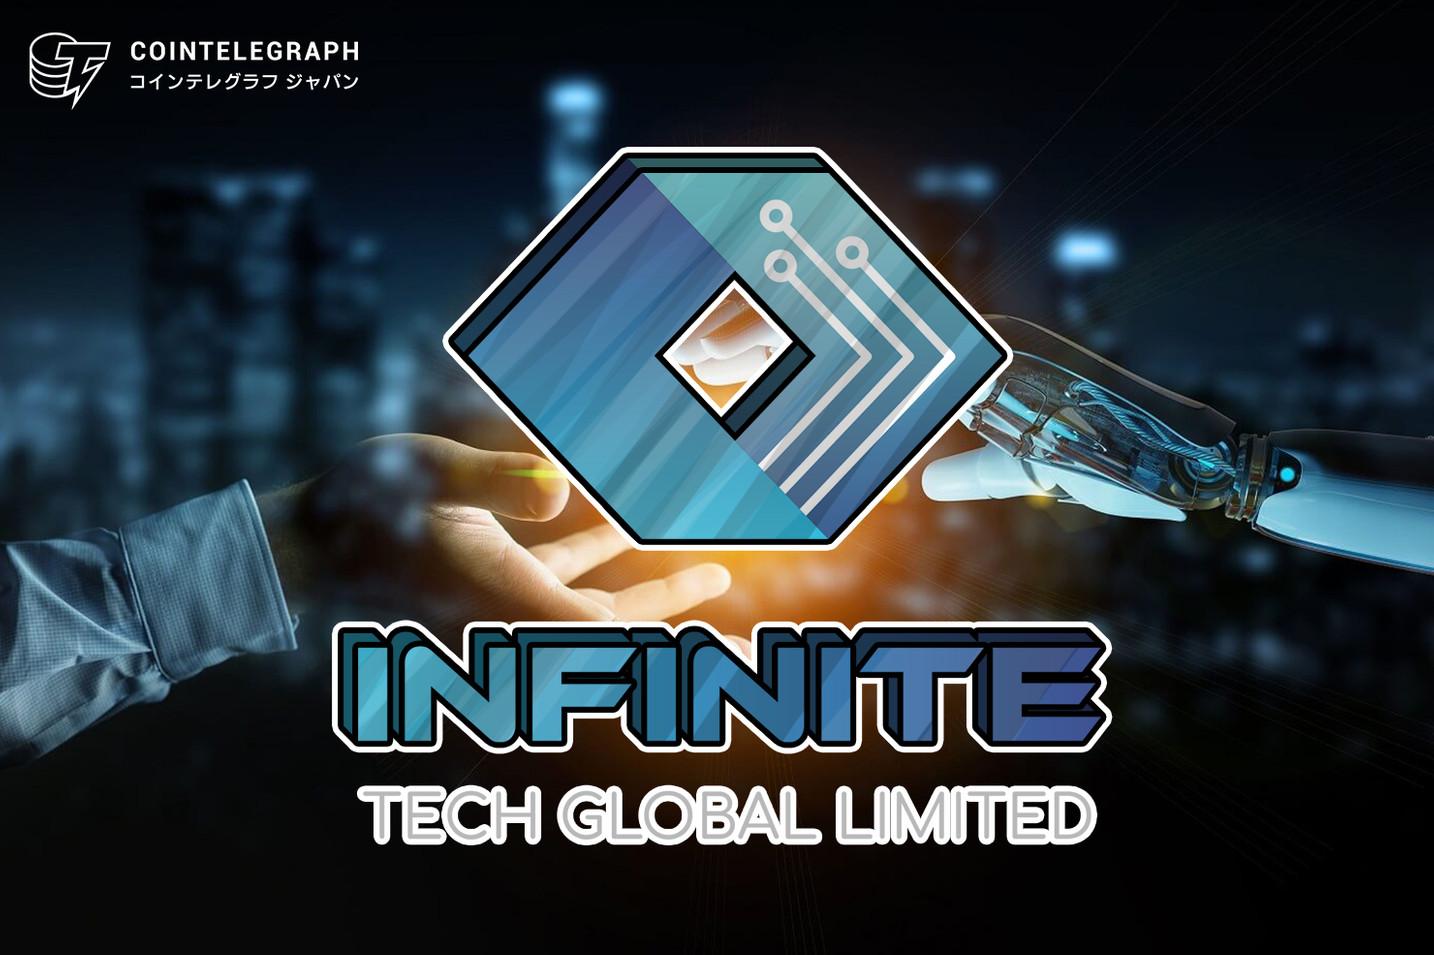 INFINITEがディープラーニング、機械学習、人工知能などの最新技術をベースとしたアービトラージ取引「Infinite Quad Engine」をリリース